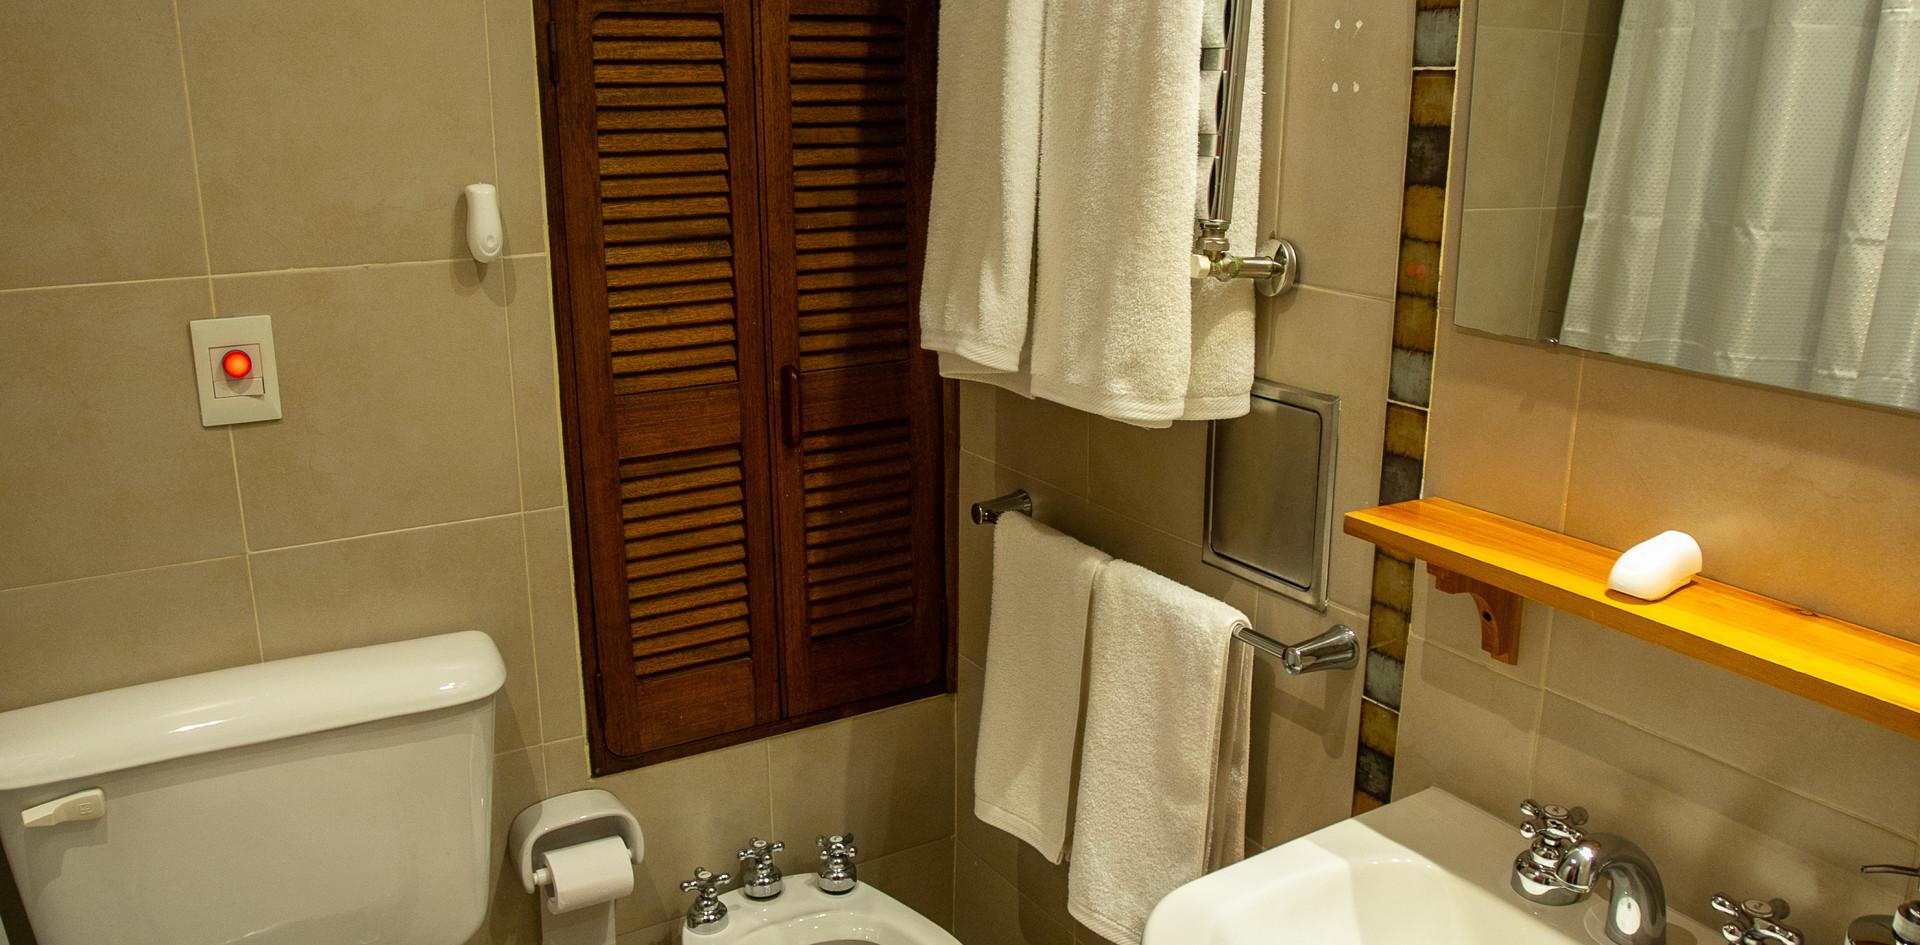 Baño standard de LH#1